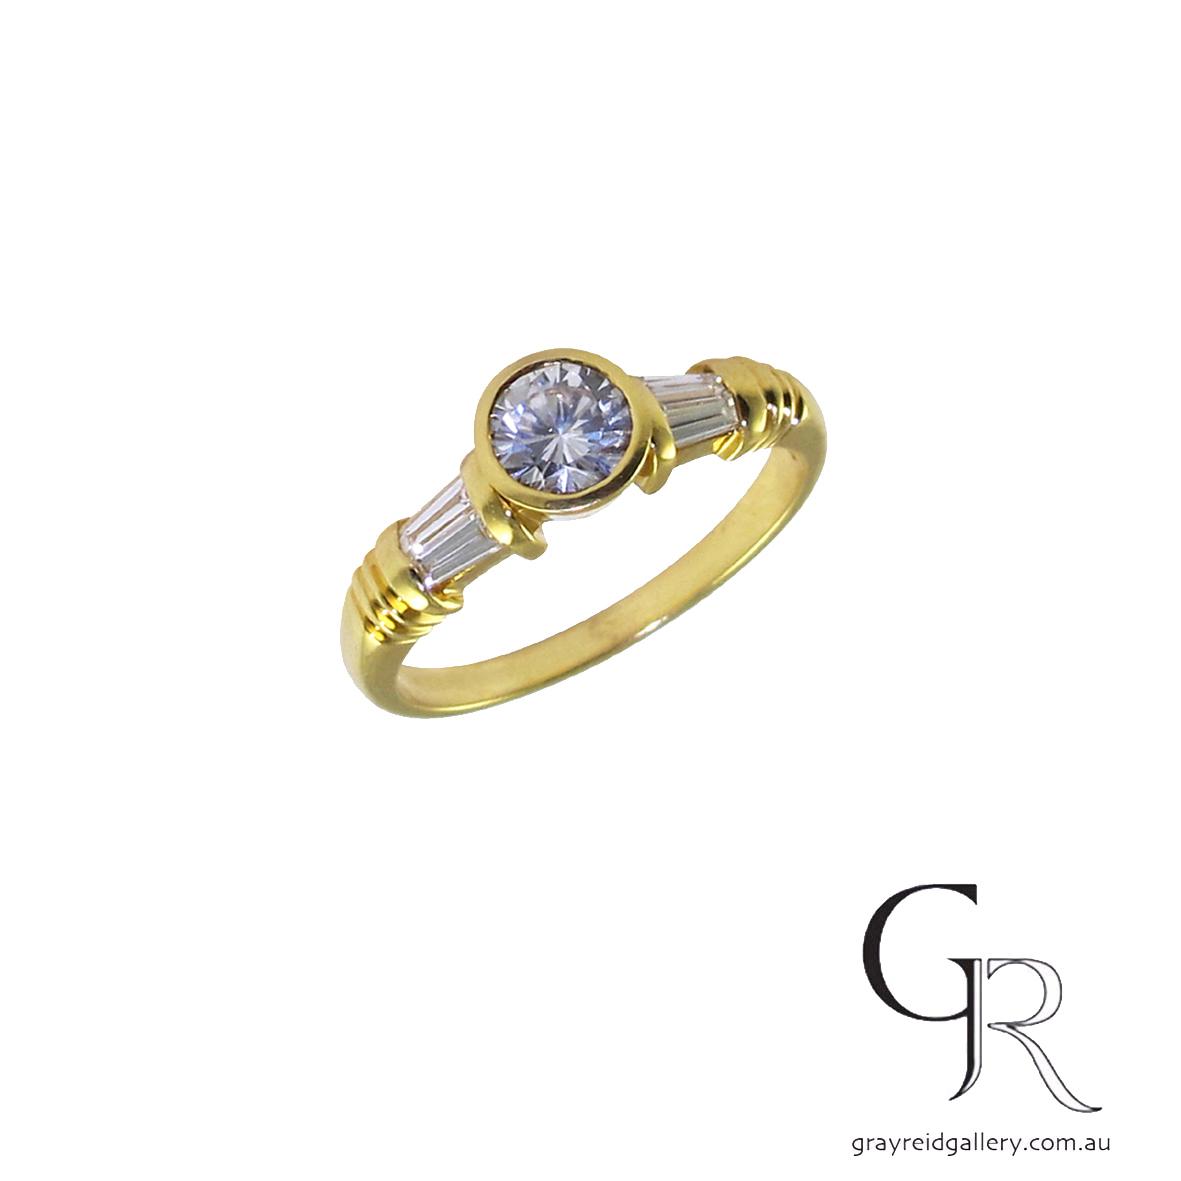 Round & Baguette Cut Diamond Engagement Ring